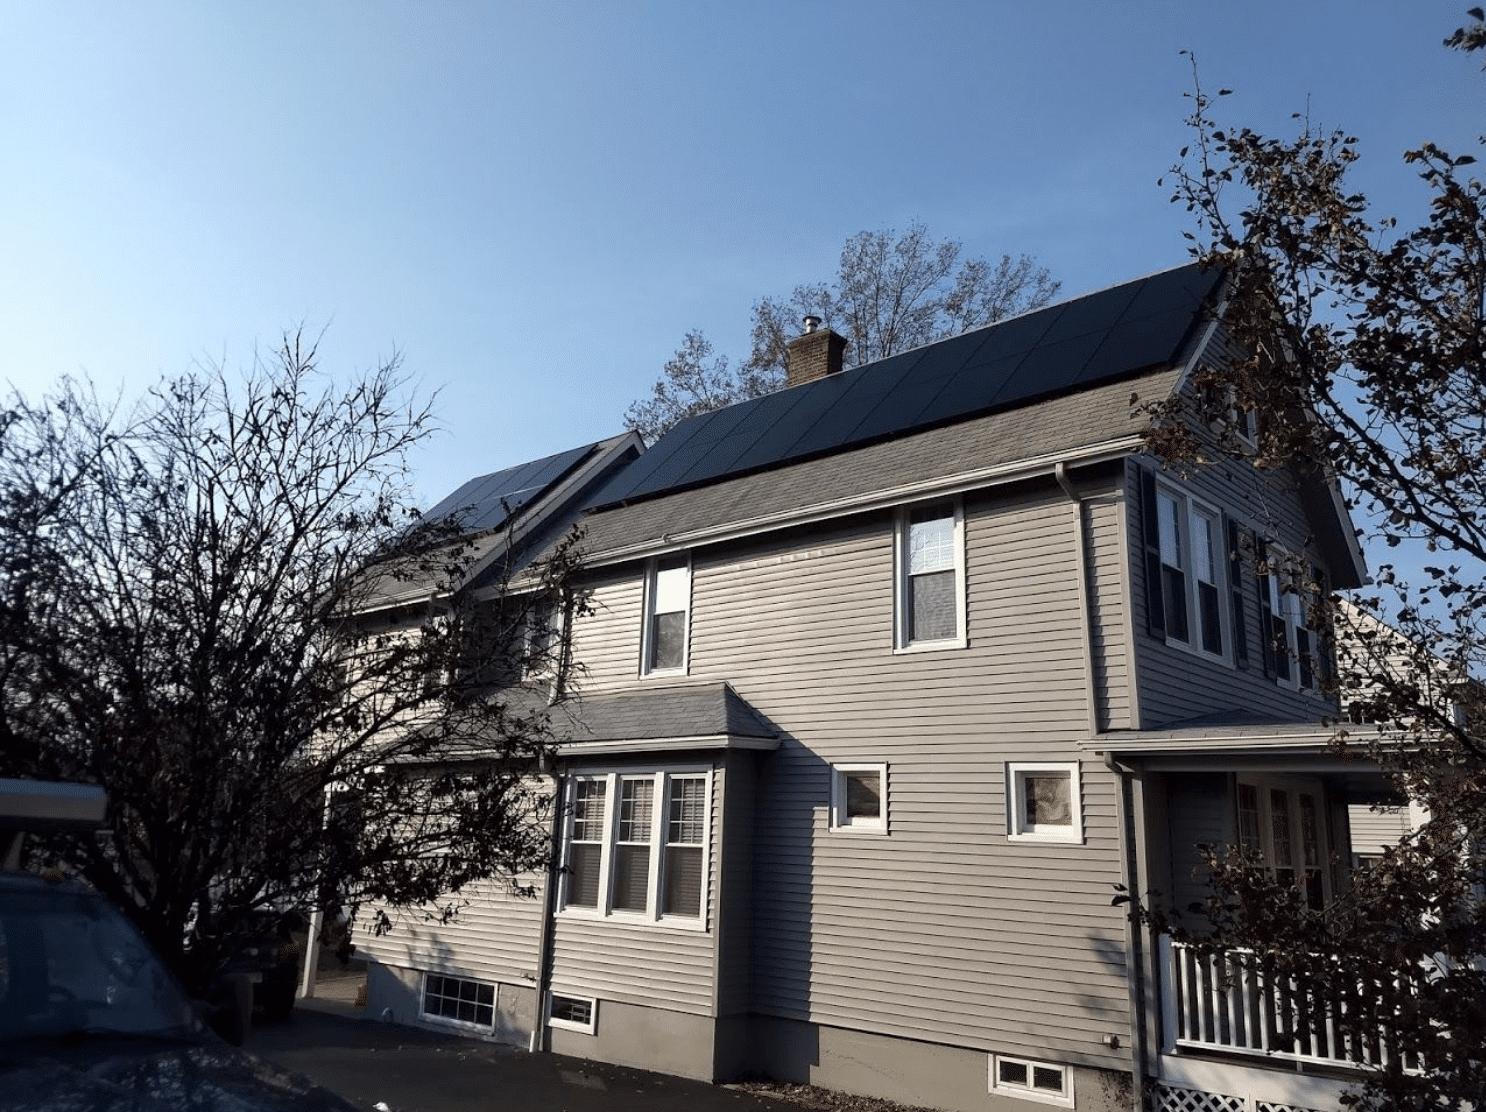 How many solar panels do I need for my home